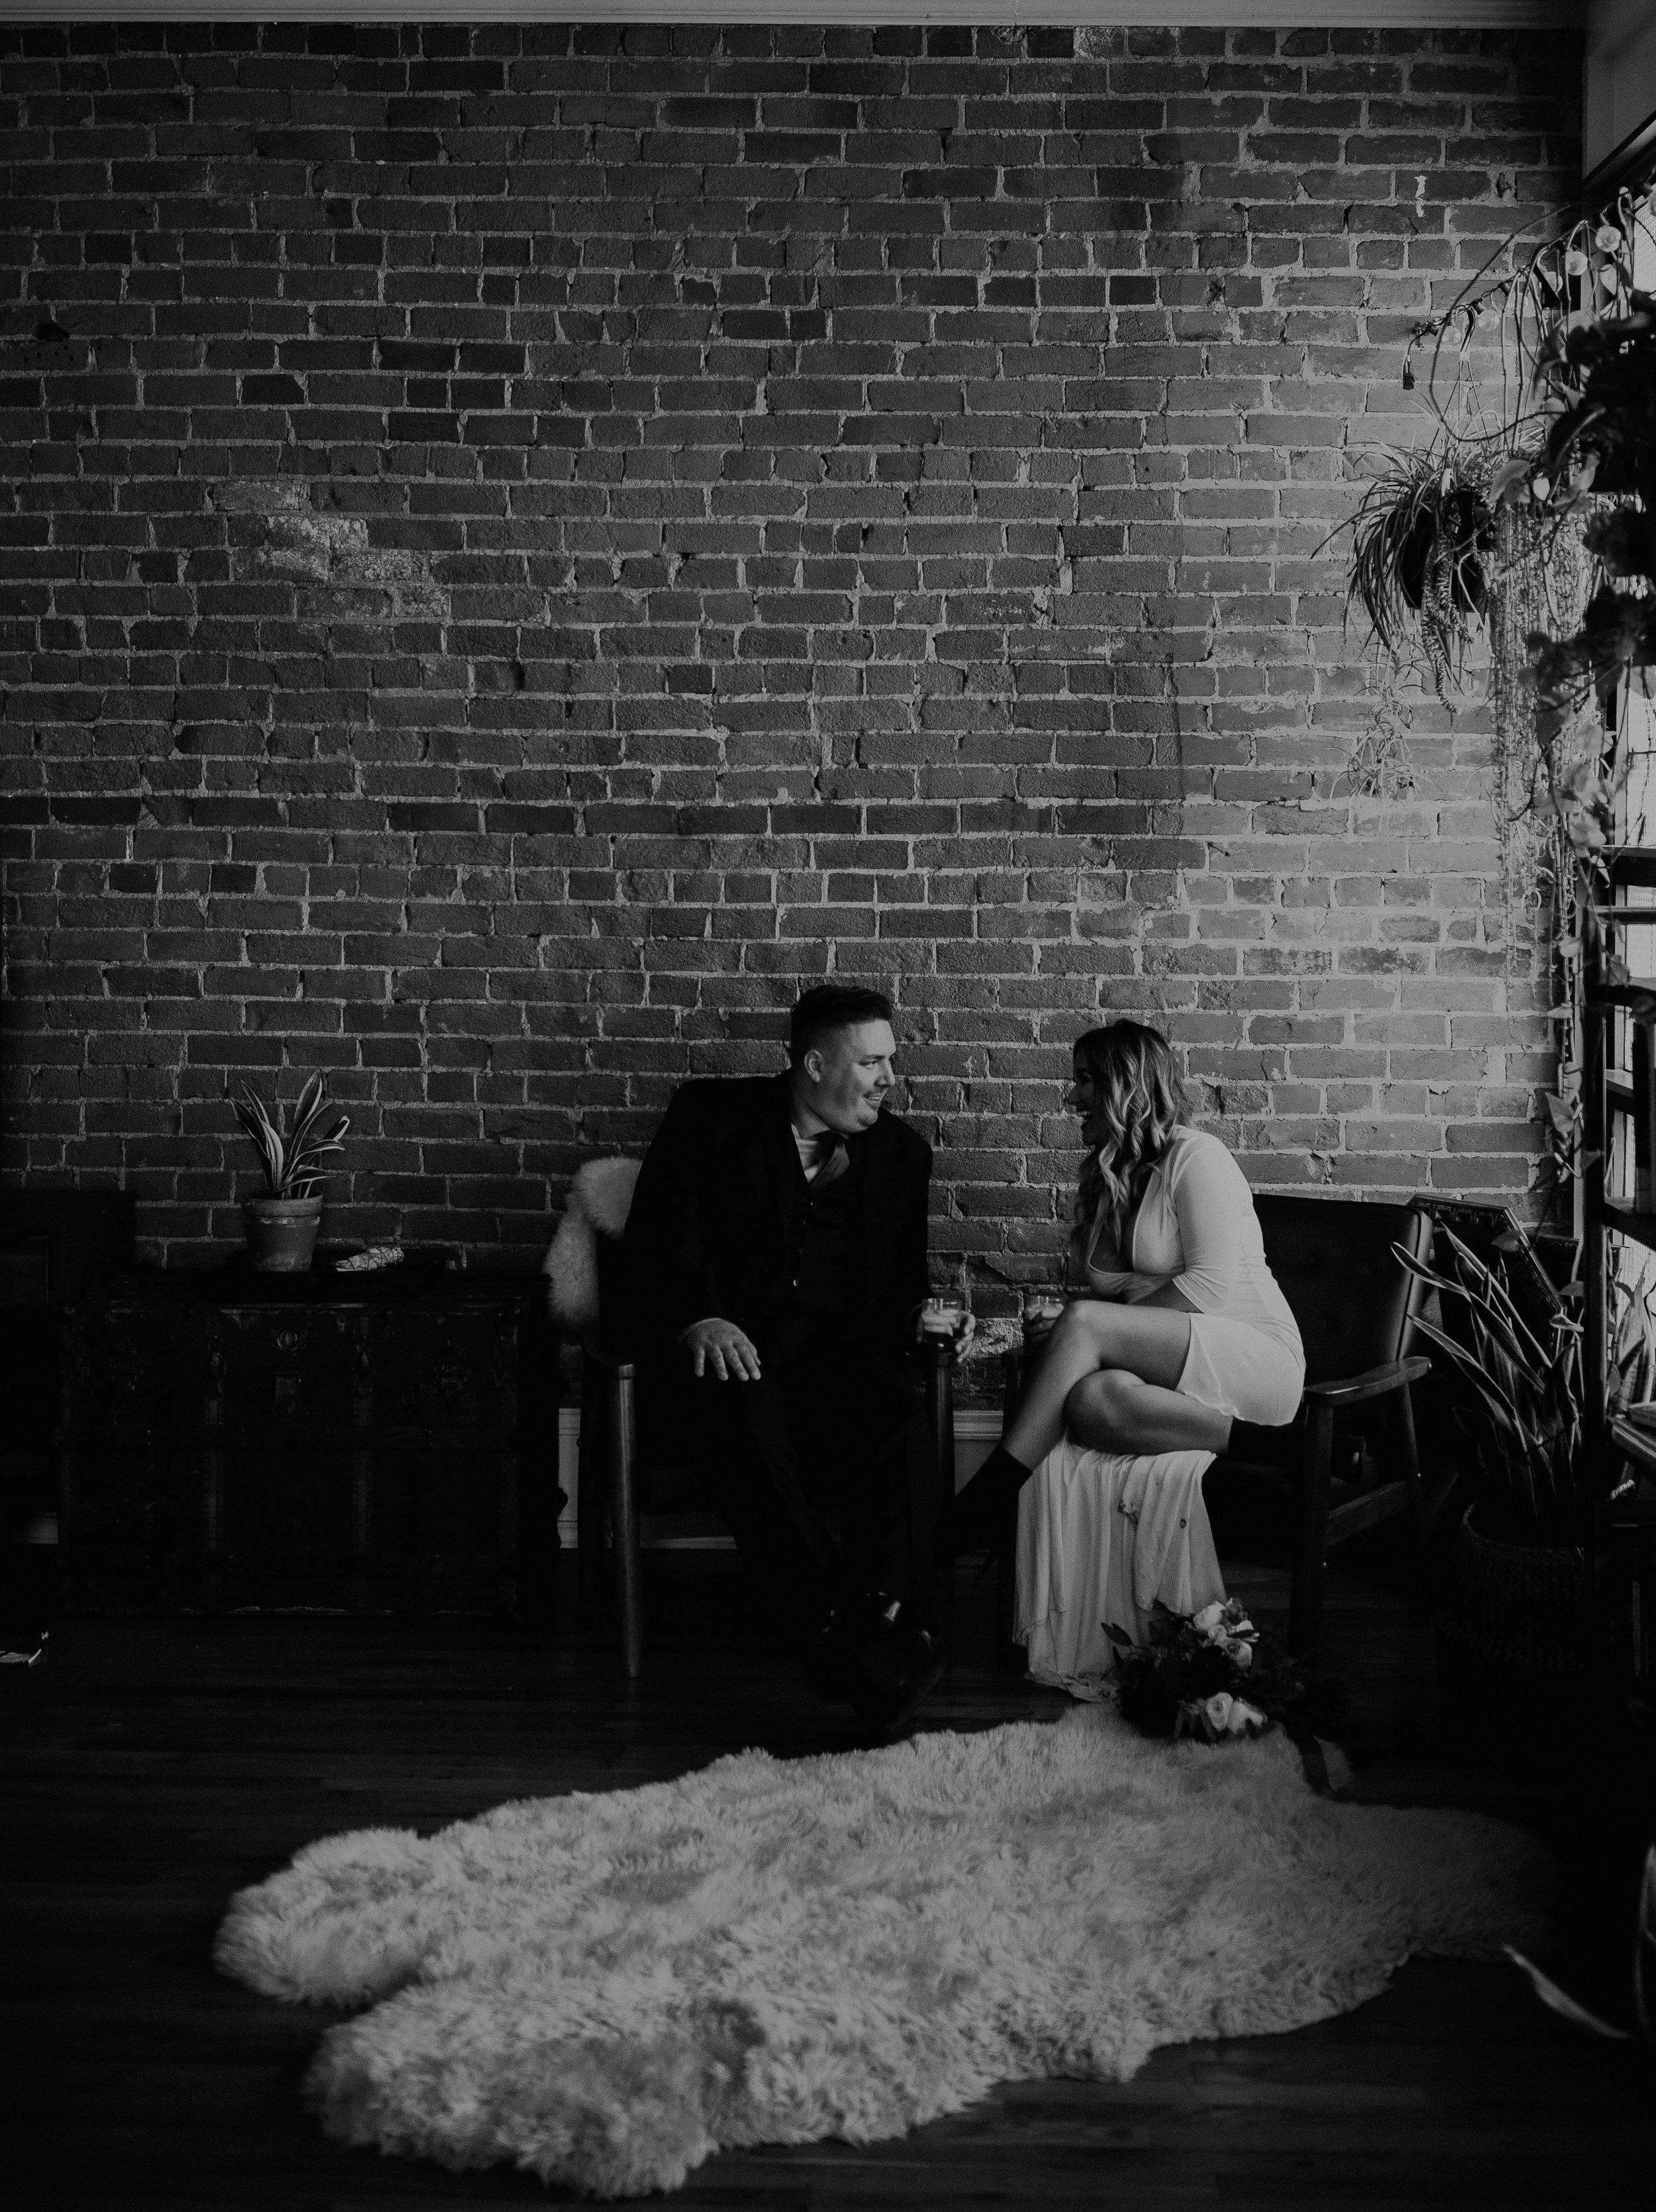 Jamie_Andrew-Urban_Artifact_Wedding-EDIT-87.JPG